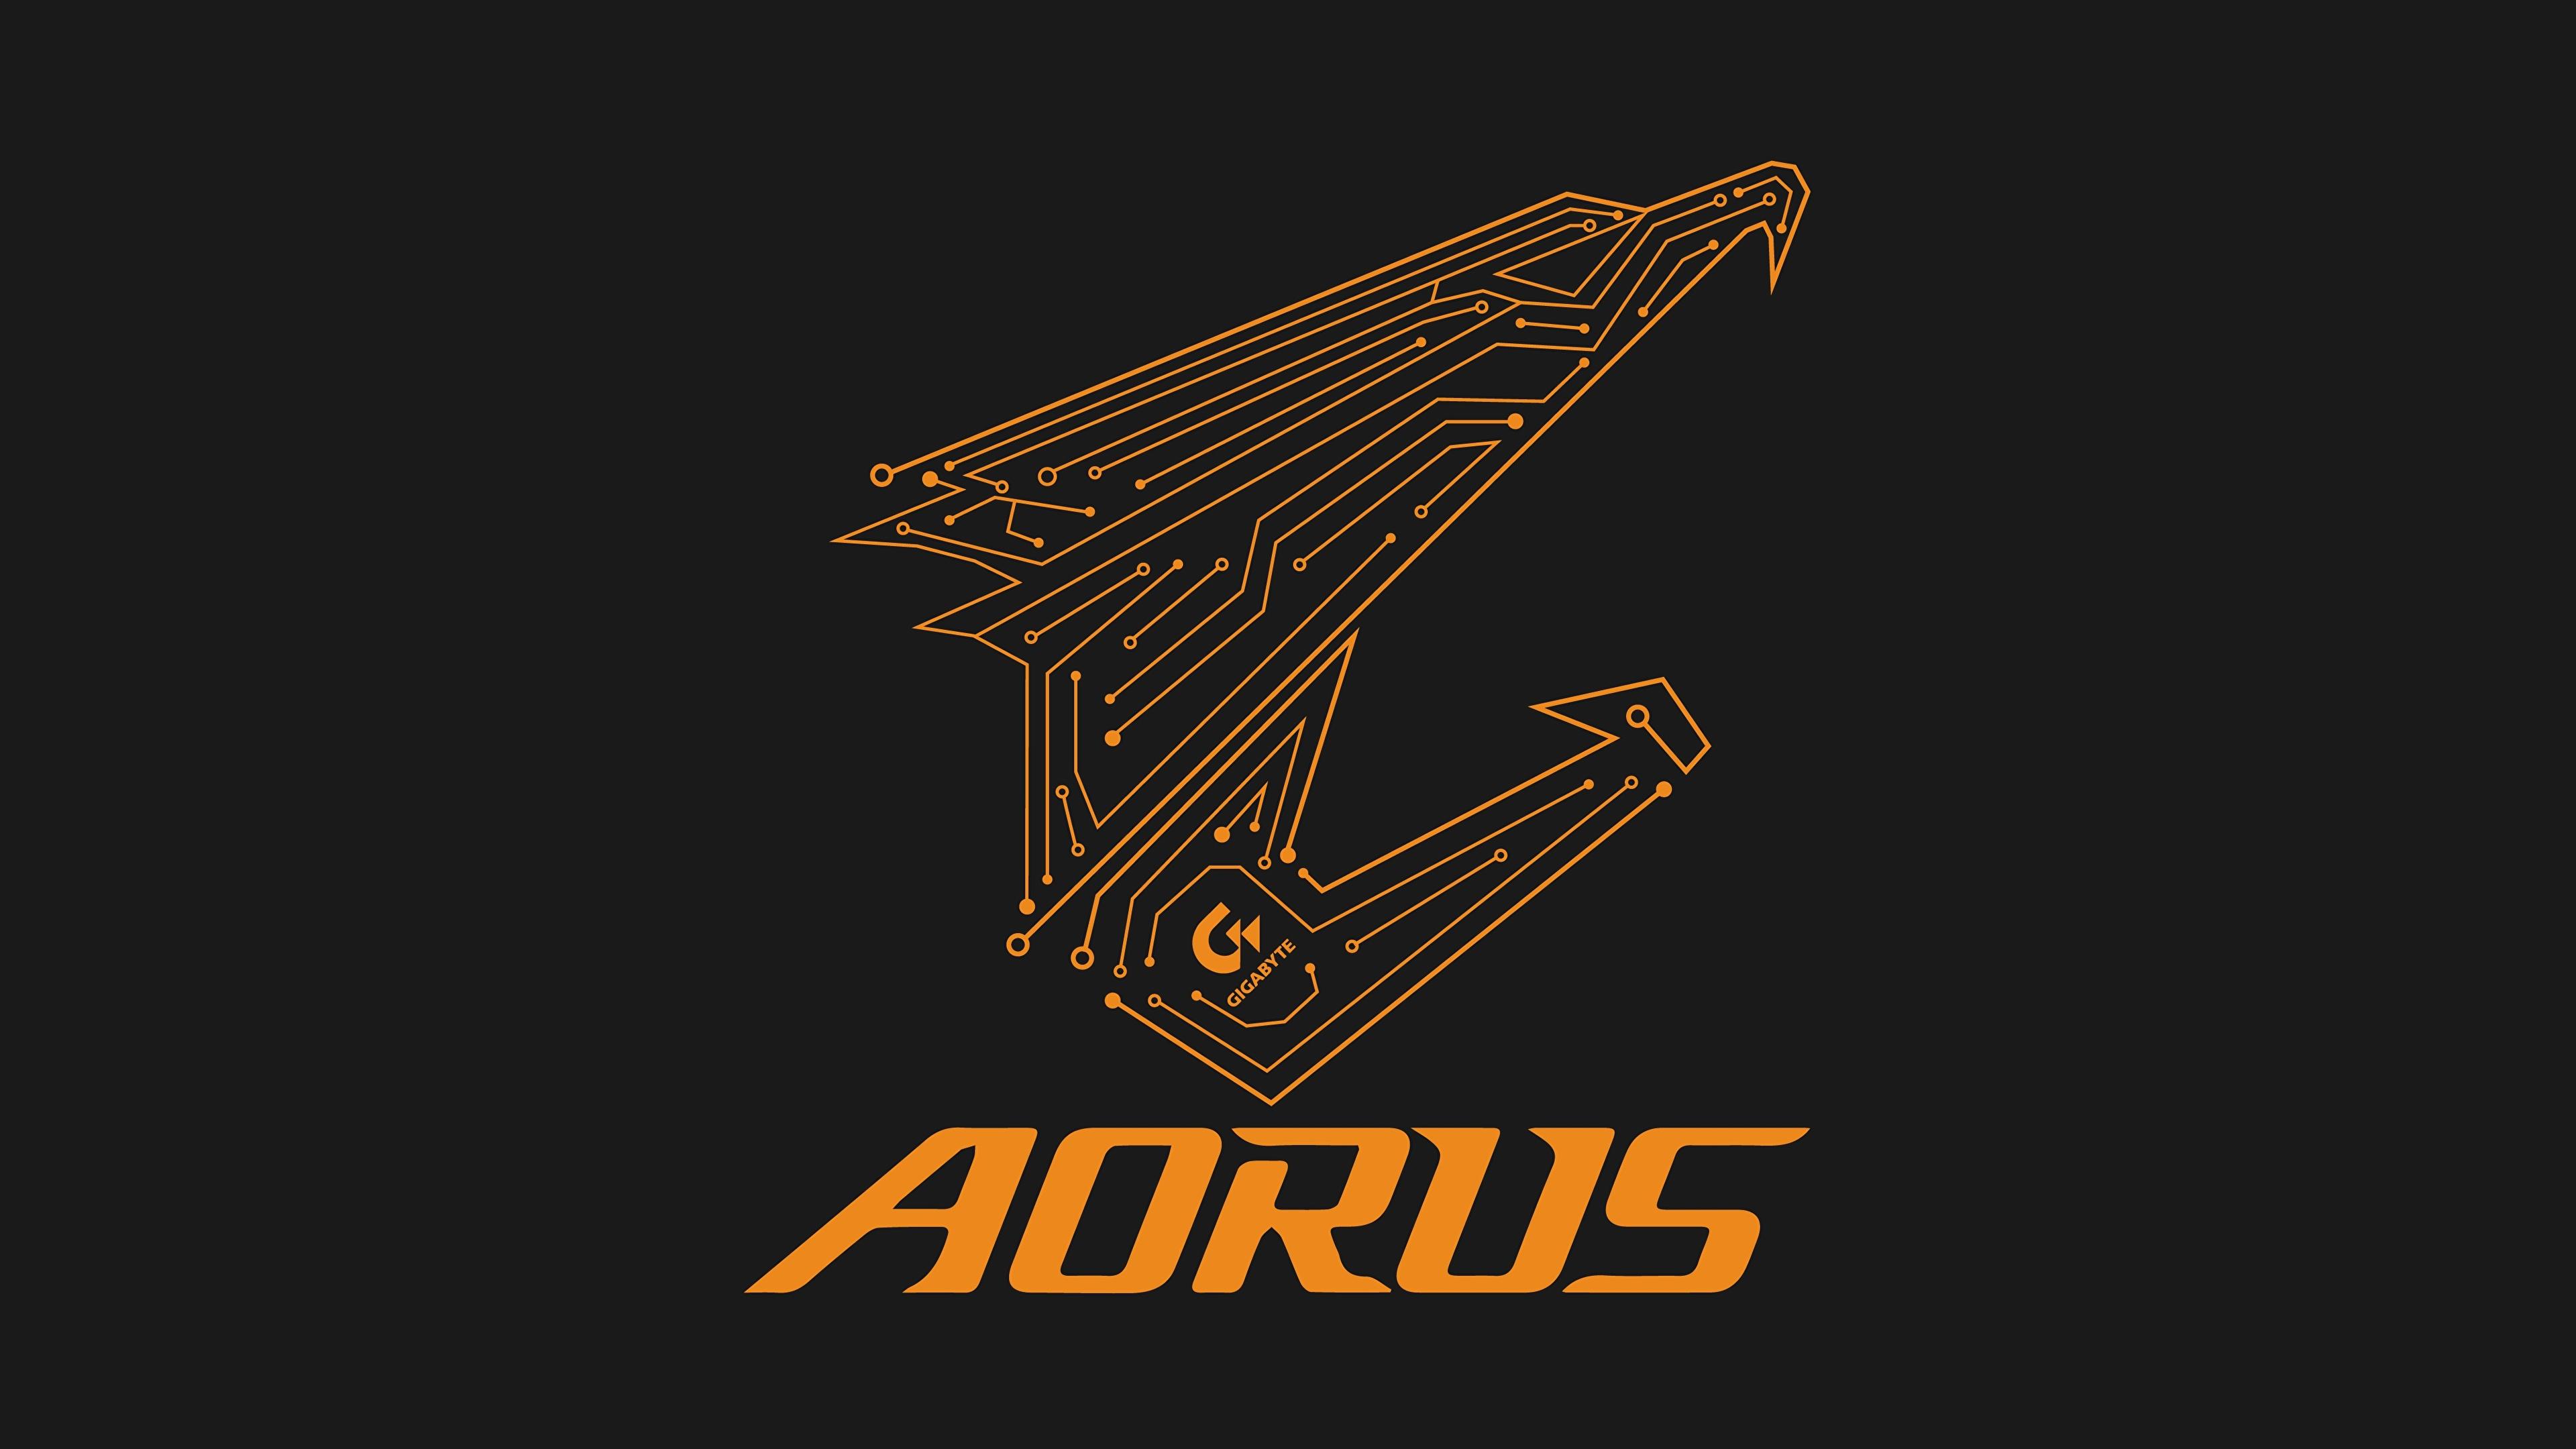 Wallpaper Logo Emblem gigabyte aorus Computers 3840x2160.